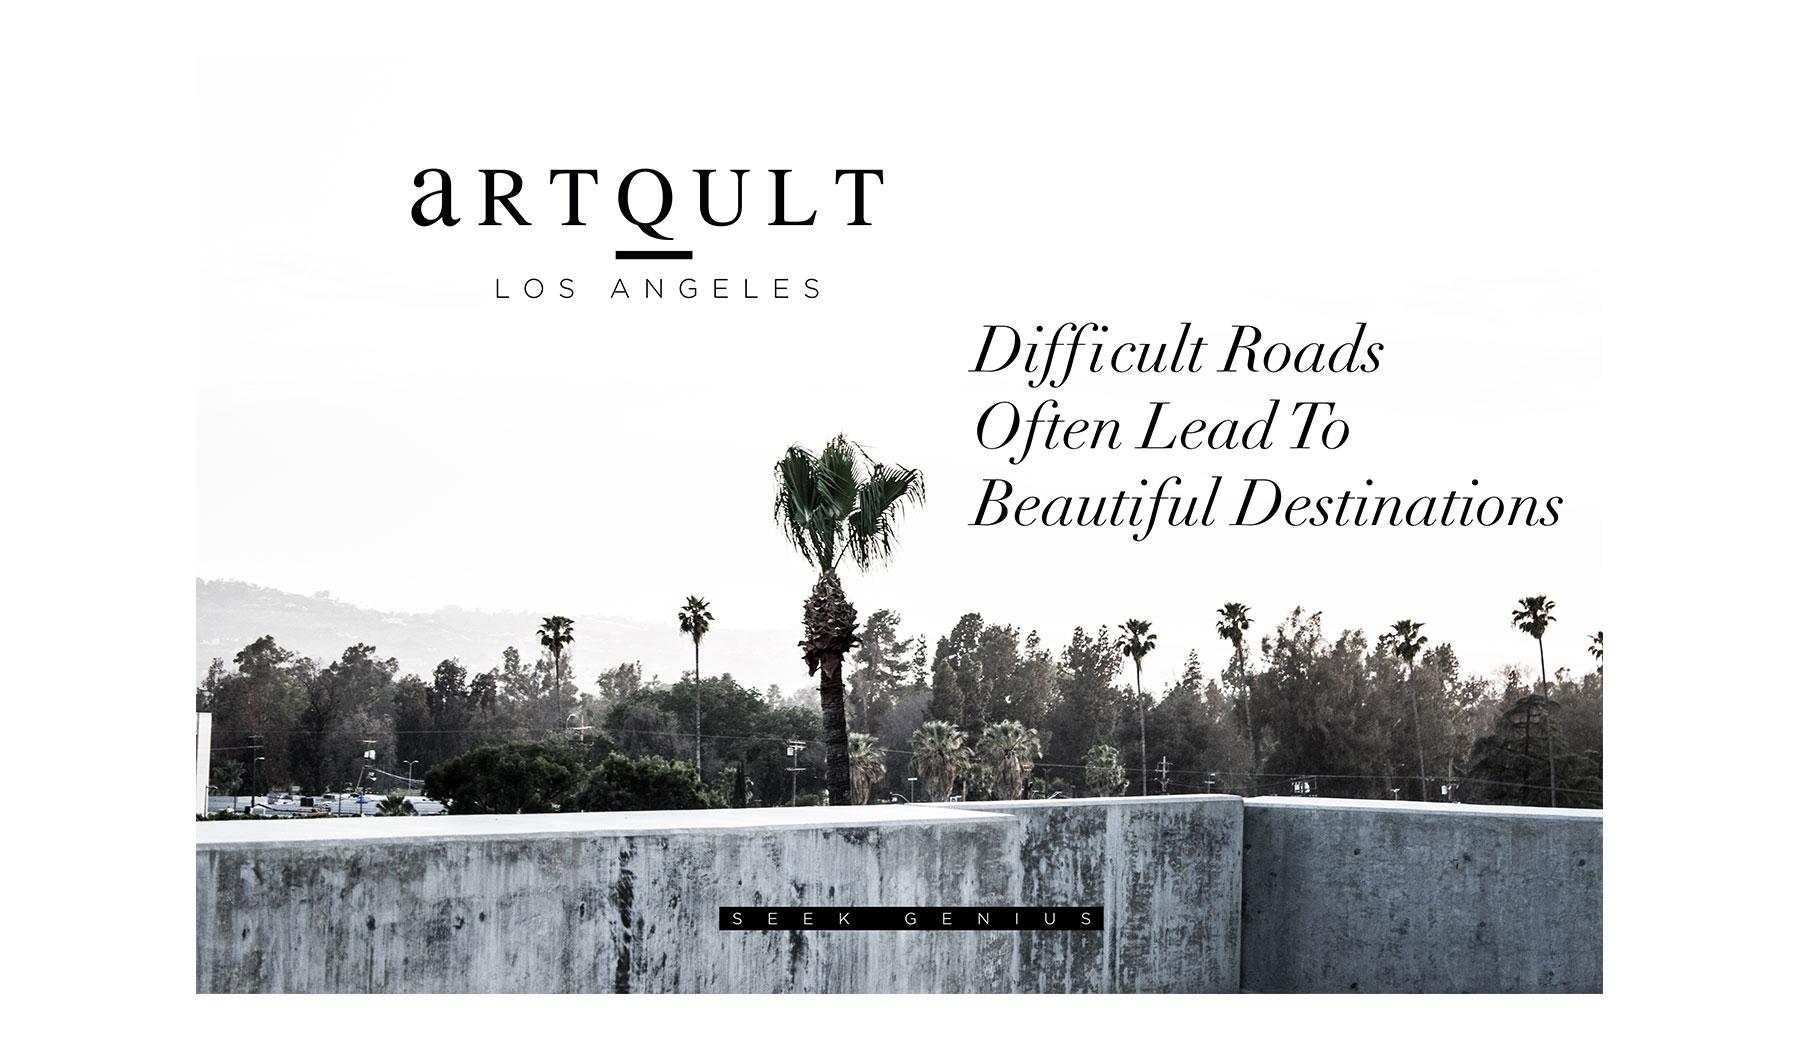 ARTQULT-LOS-ANGELES-LOOKBOOK-14.jpg